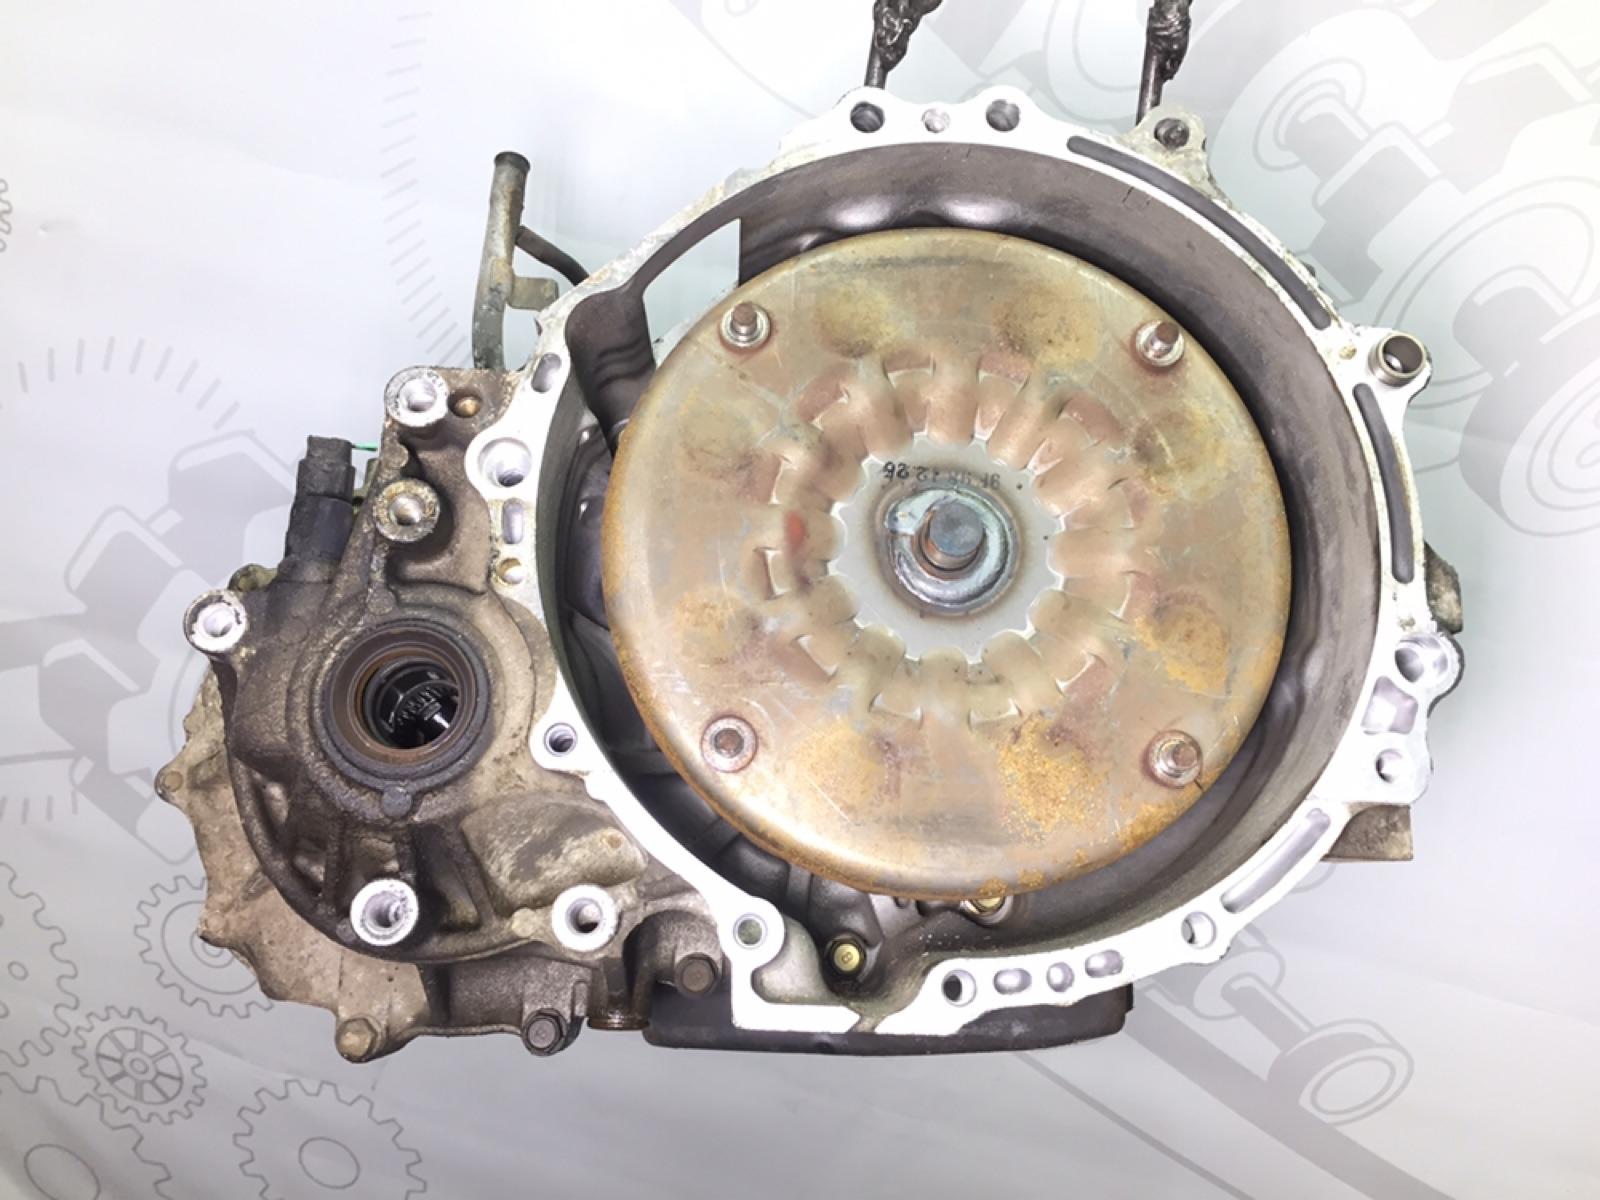 Кпп автоматическая (акпп) Mazda Xedos 6 2.0 I 1999 (б/у)